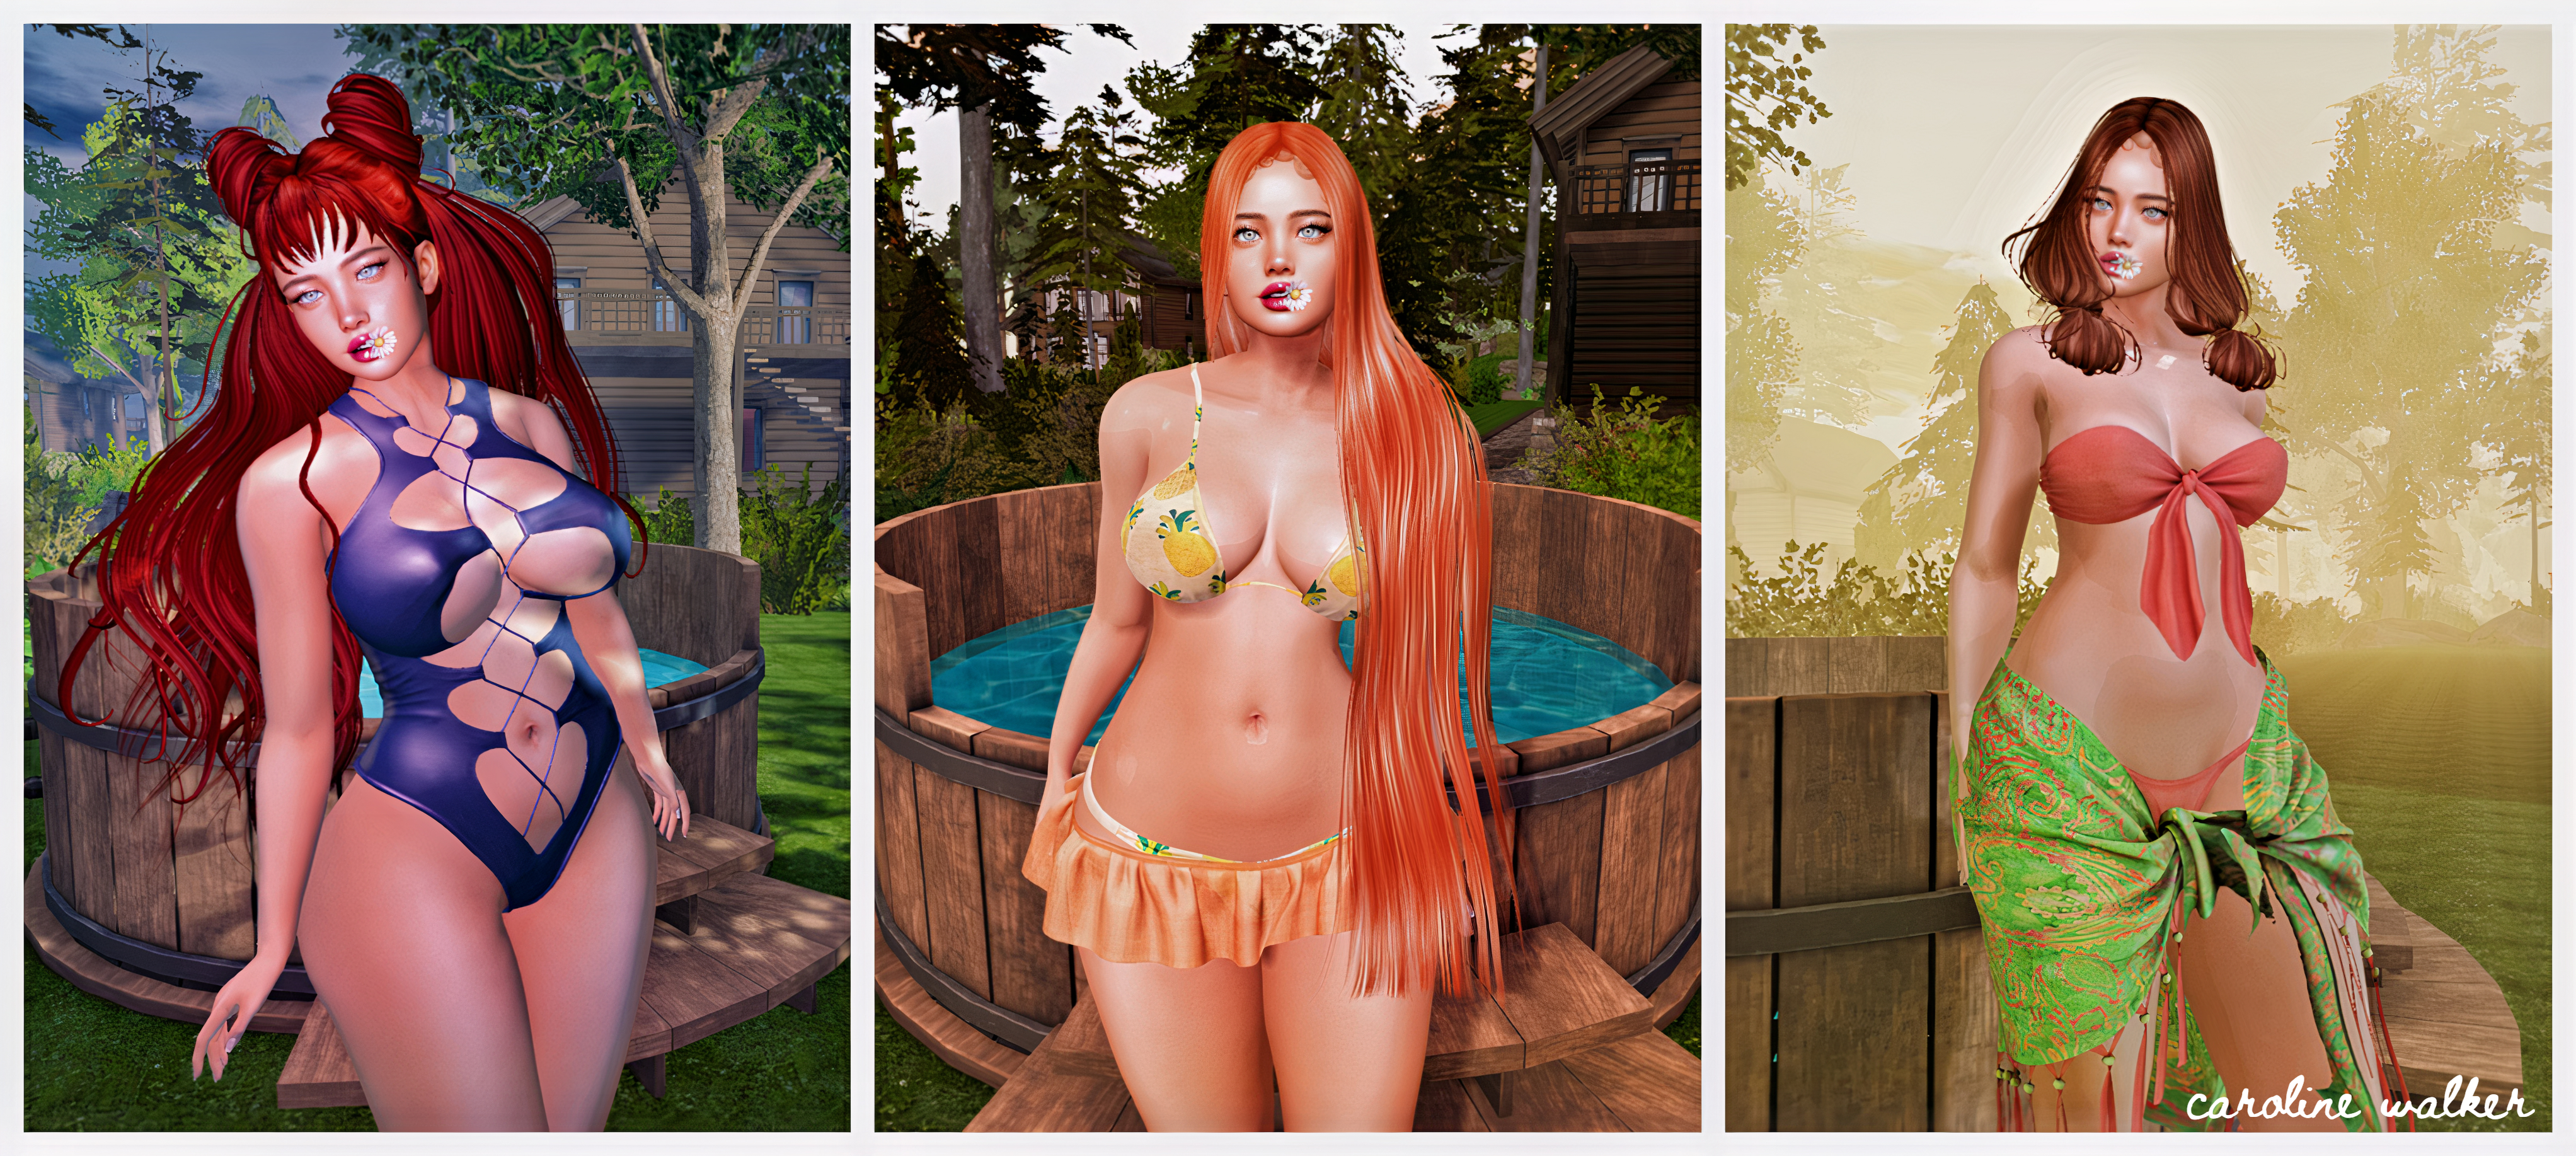 Hot Tub Styles